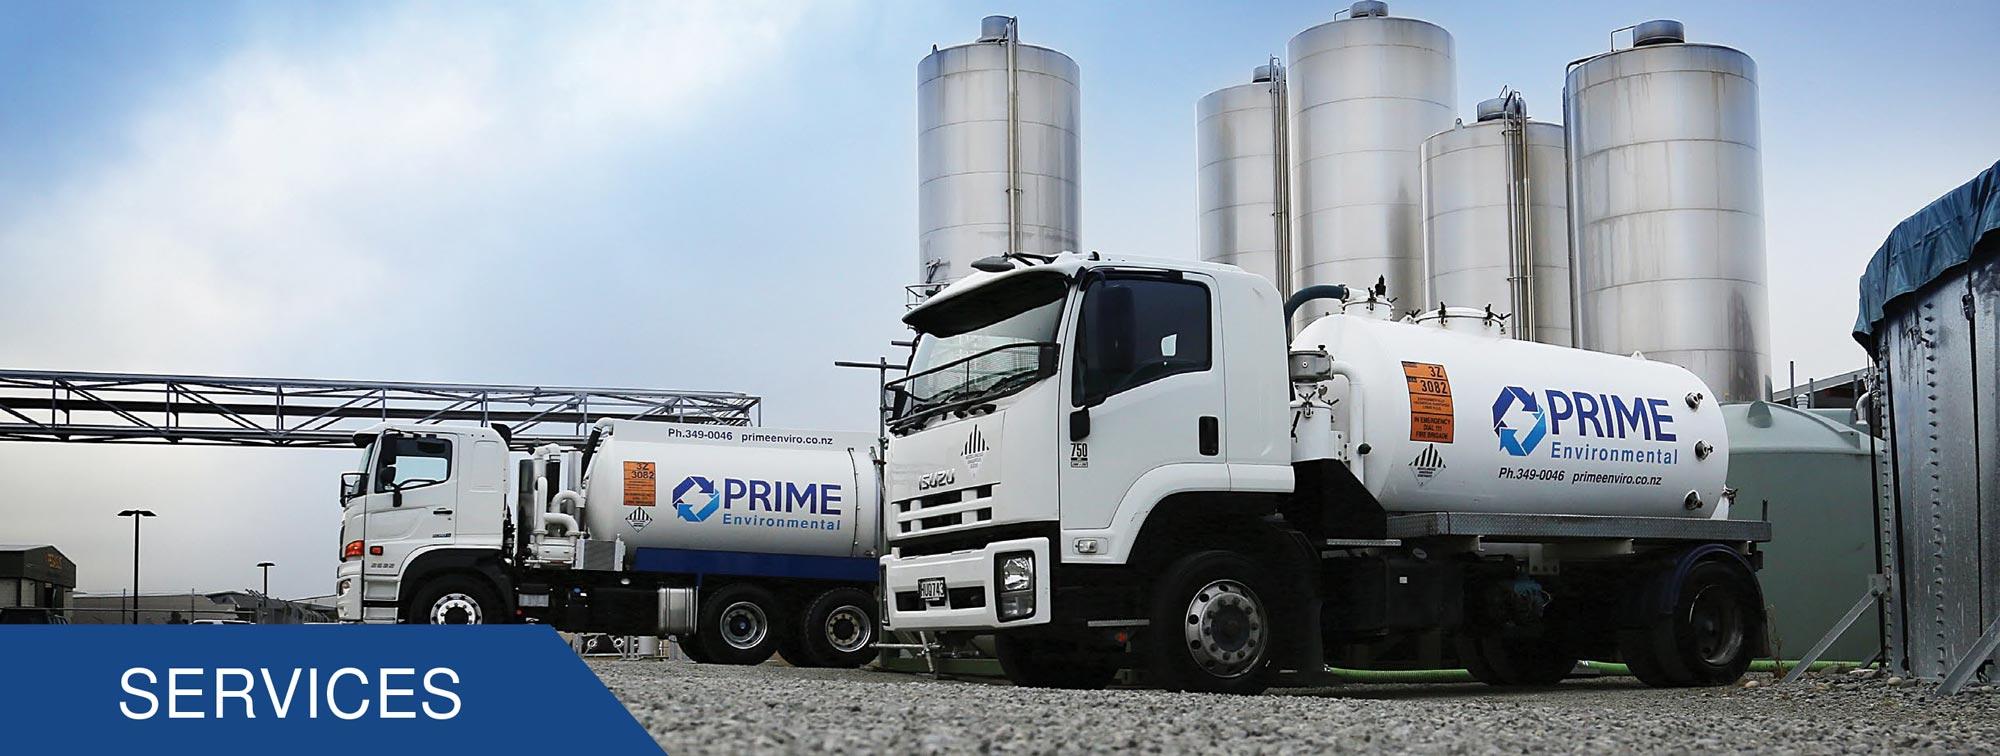 Prime Enviro services waste management